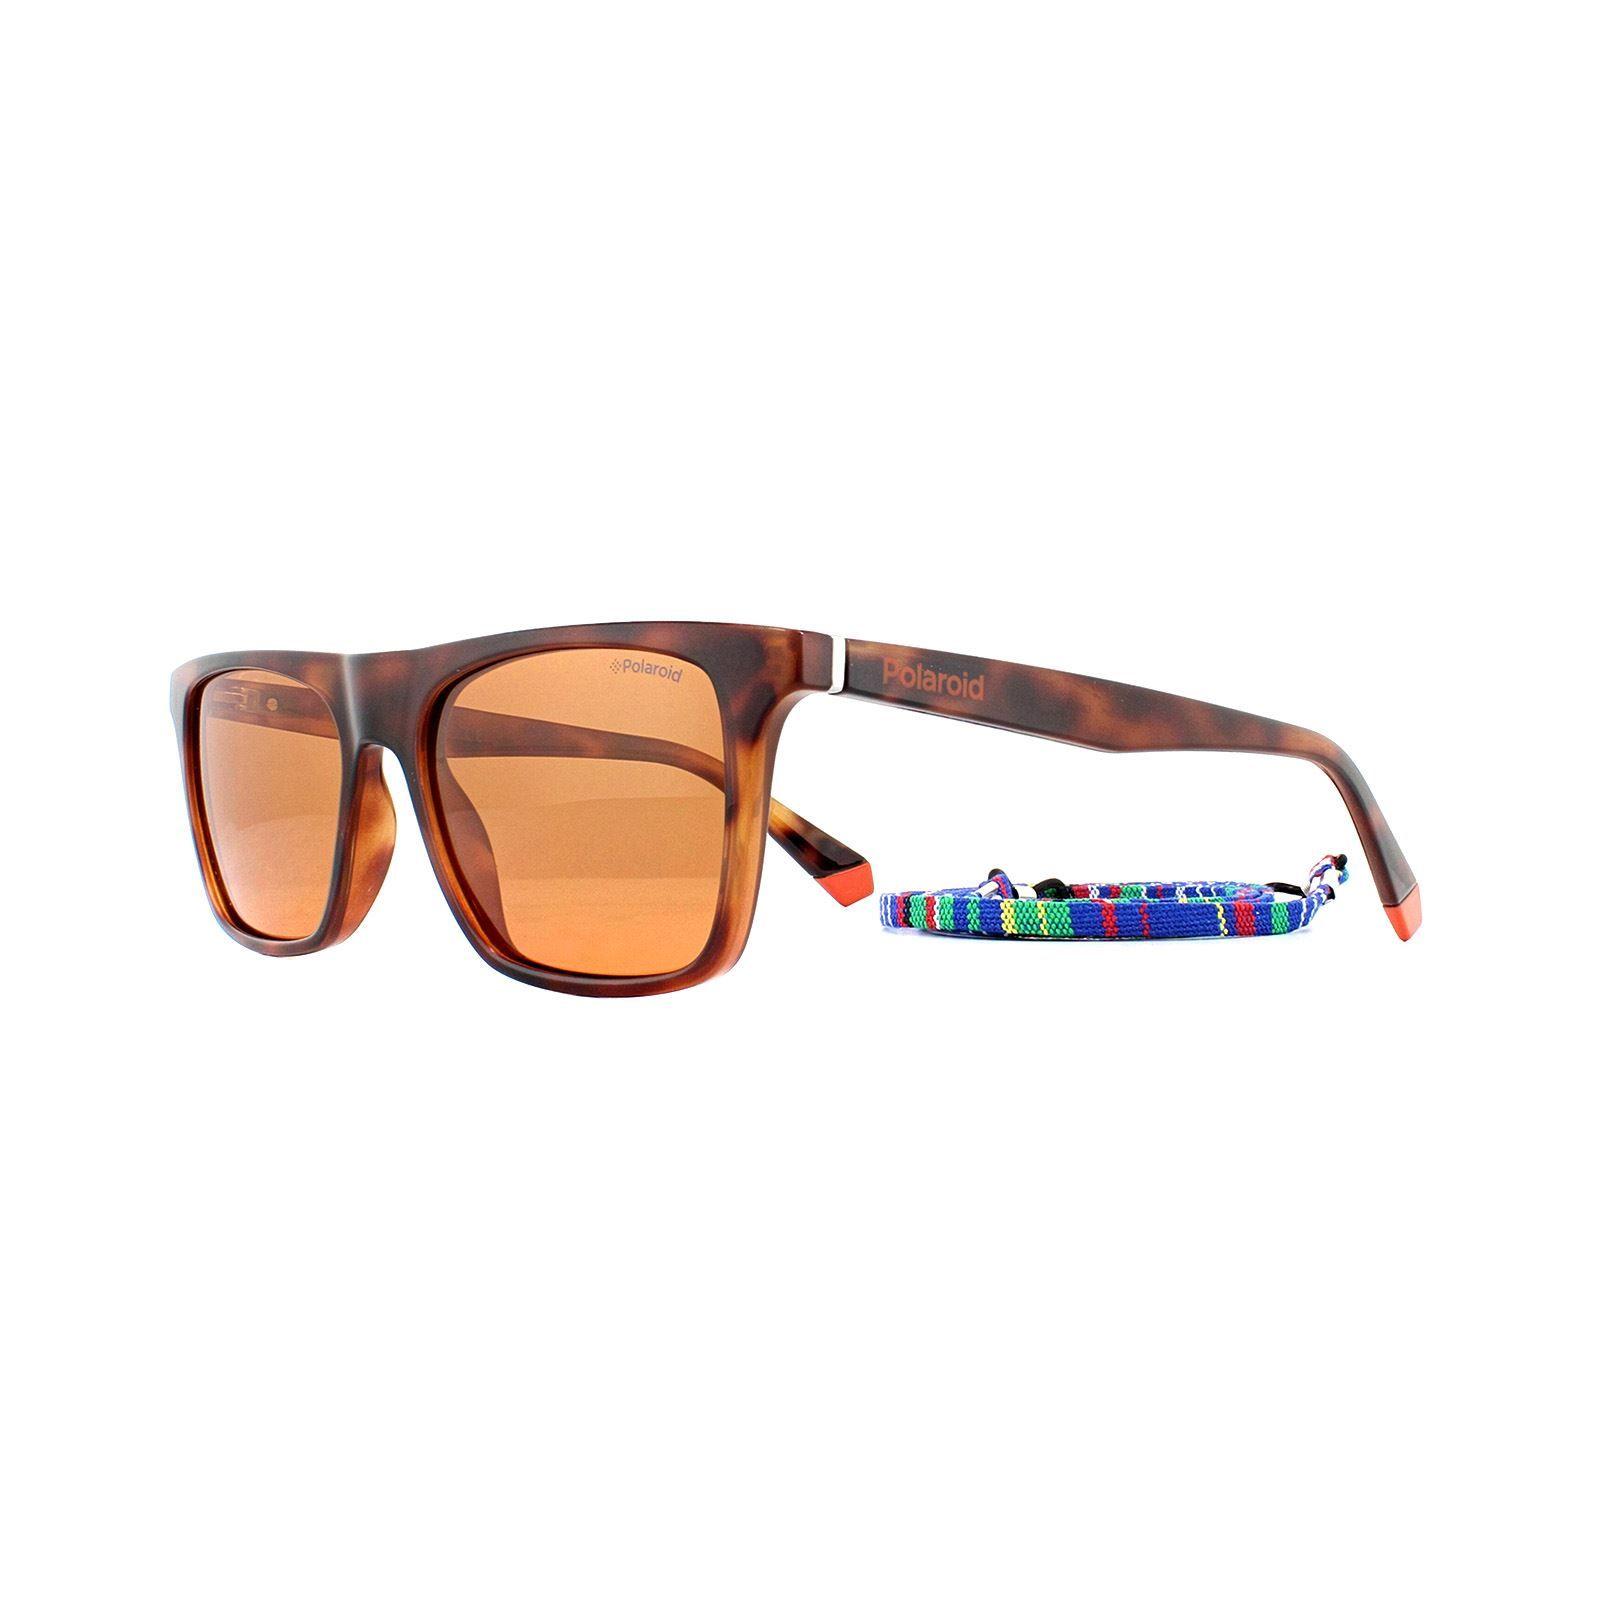 Polaroid Sunglasses 6110/S L9G HE Havana Orange Copper Polarized